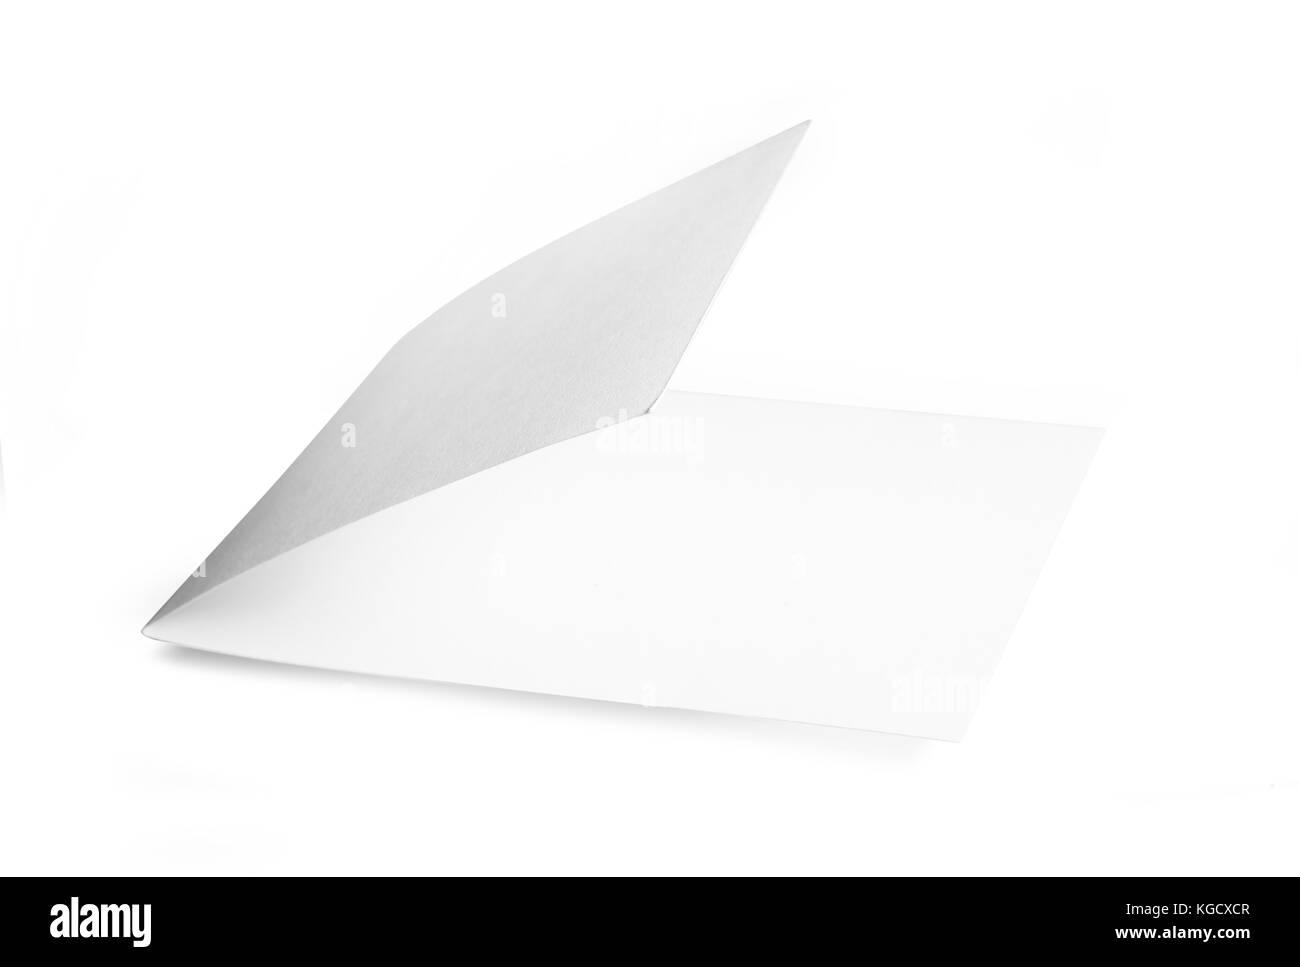 Folleto en blanco sobre fondo blanco aisladas con trazado de recorte. Foto de stock